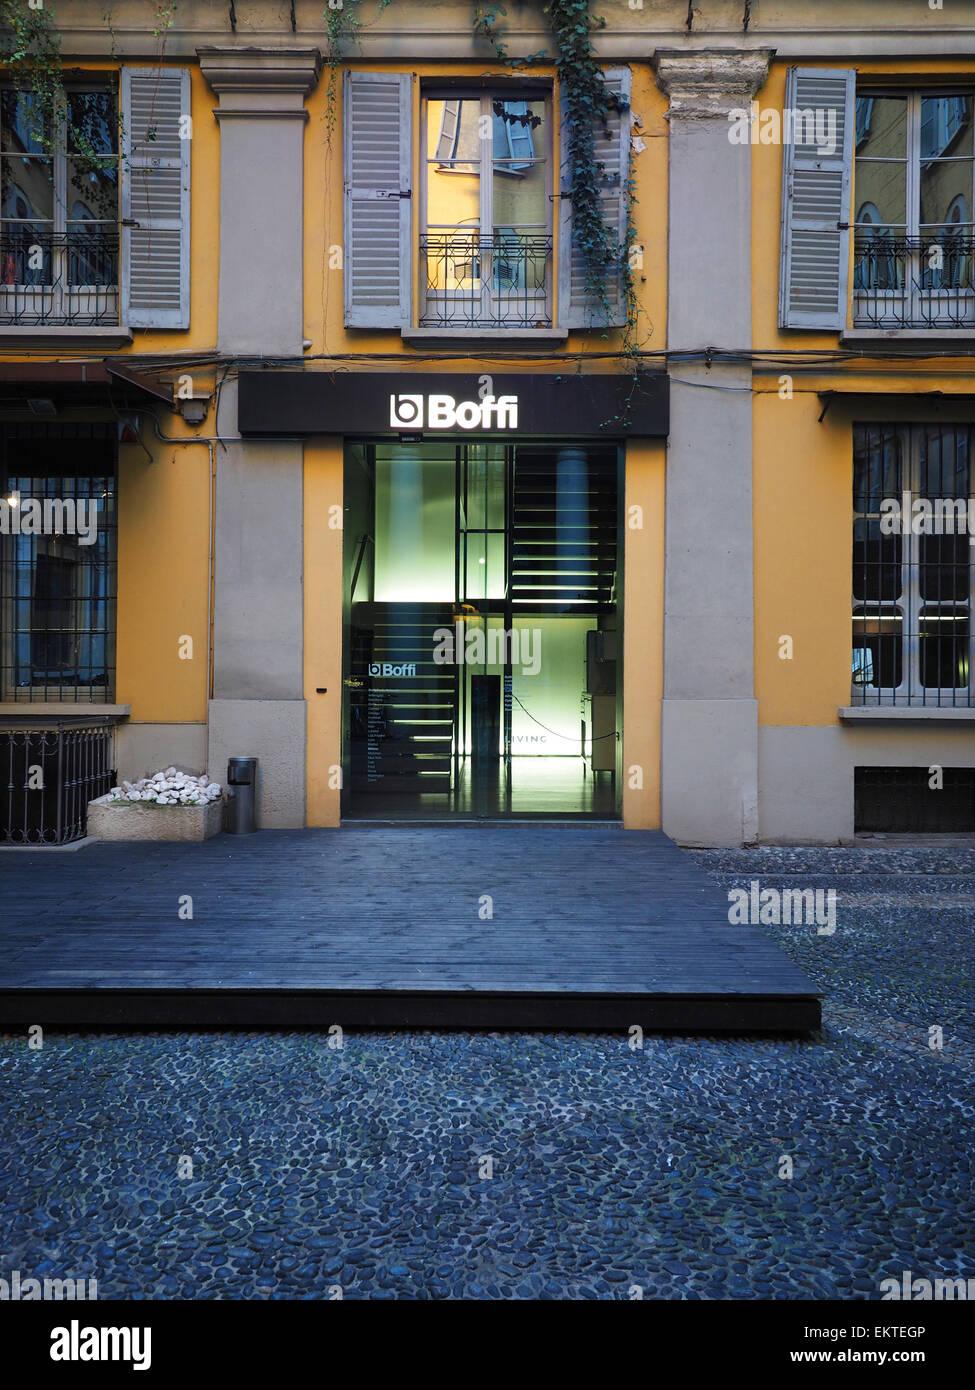 Boffi Furniture Store, Via Solferino Street, Brera District, Milan,  Lombardy, Italy, Europe